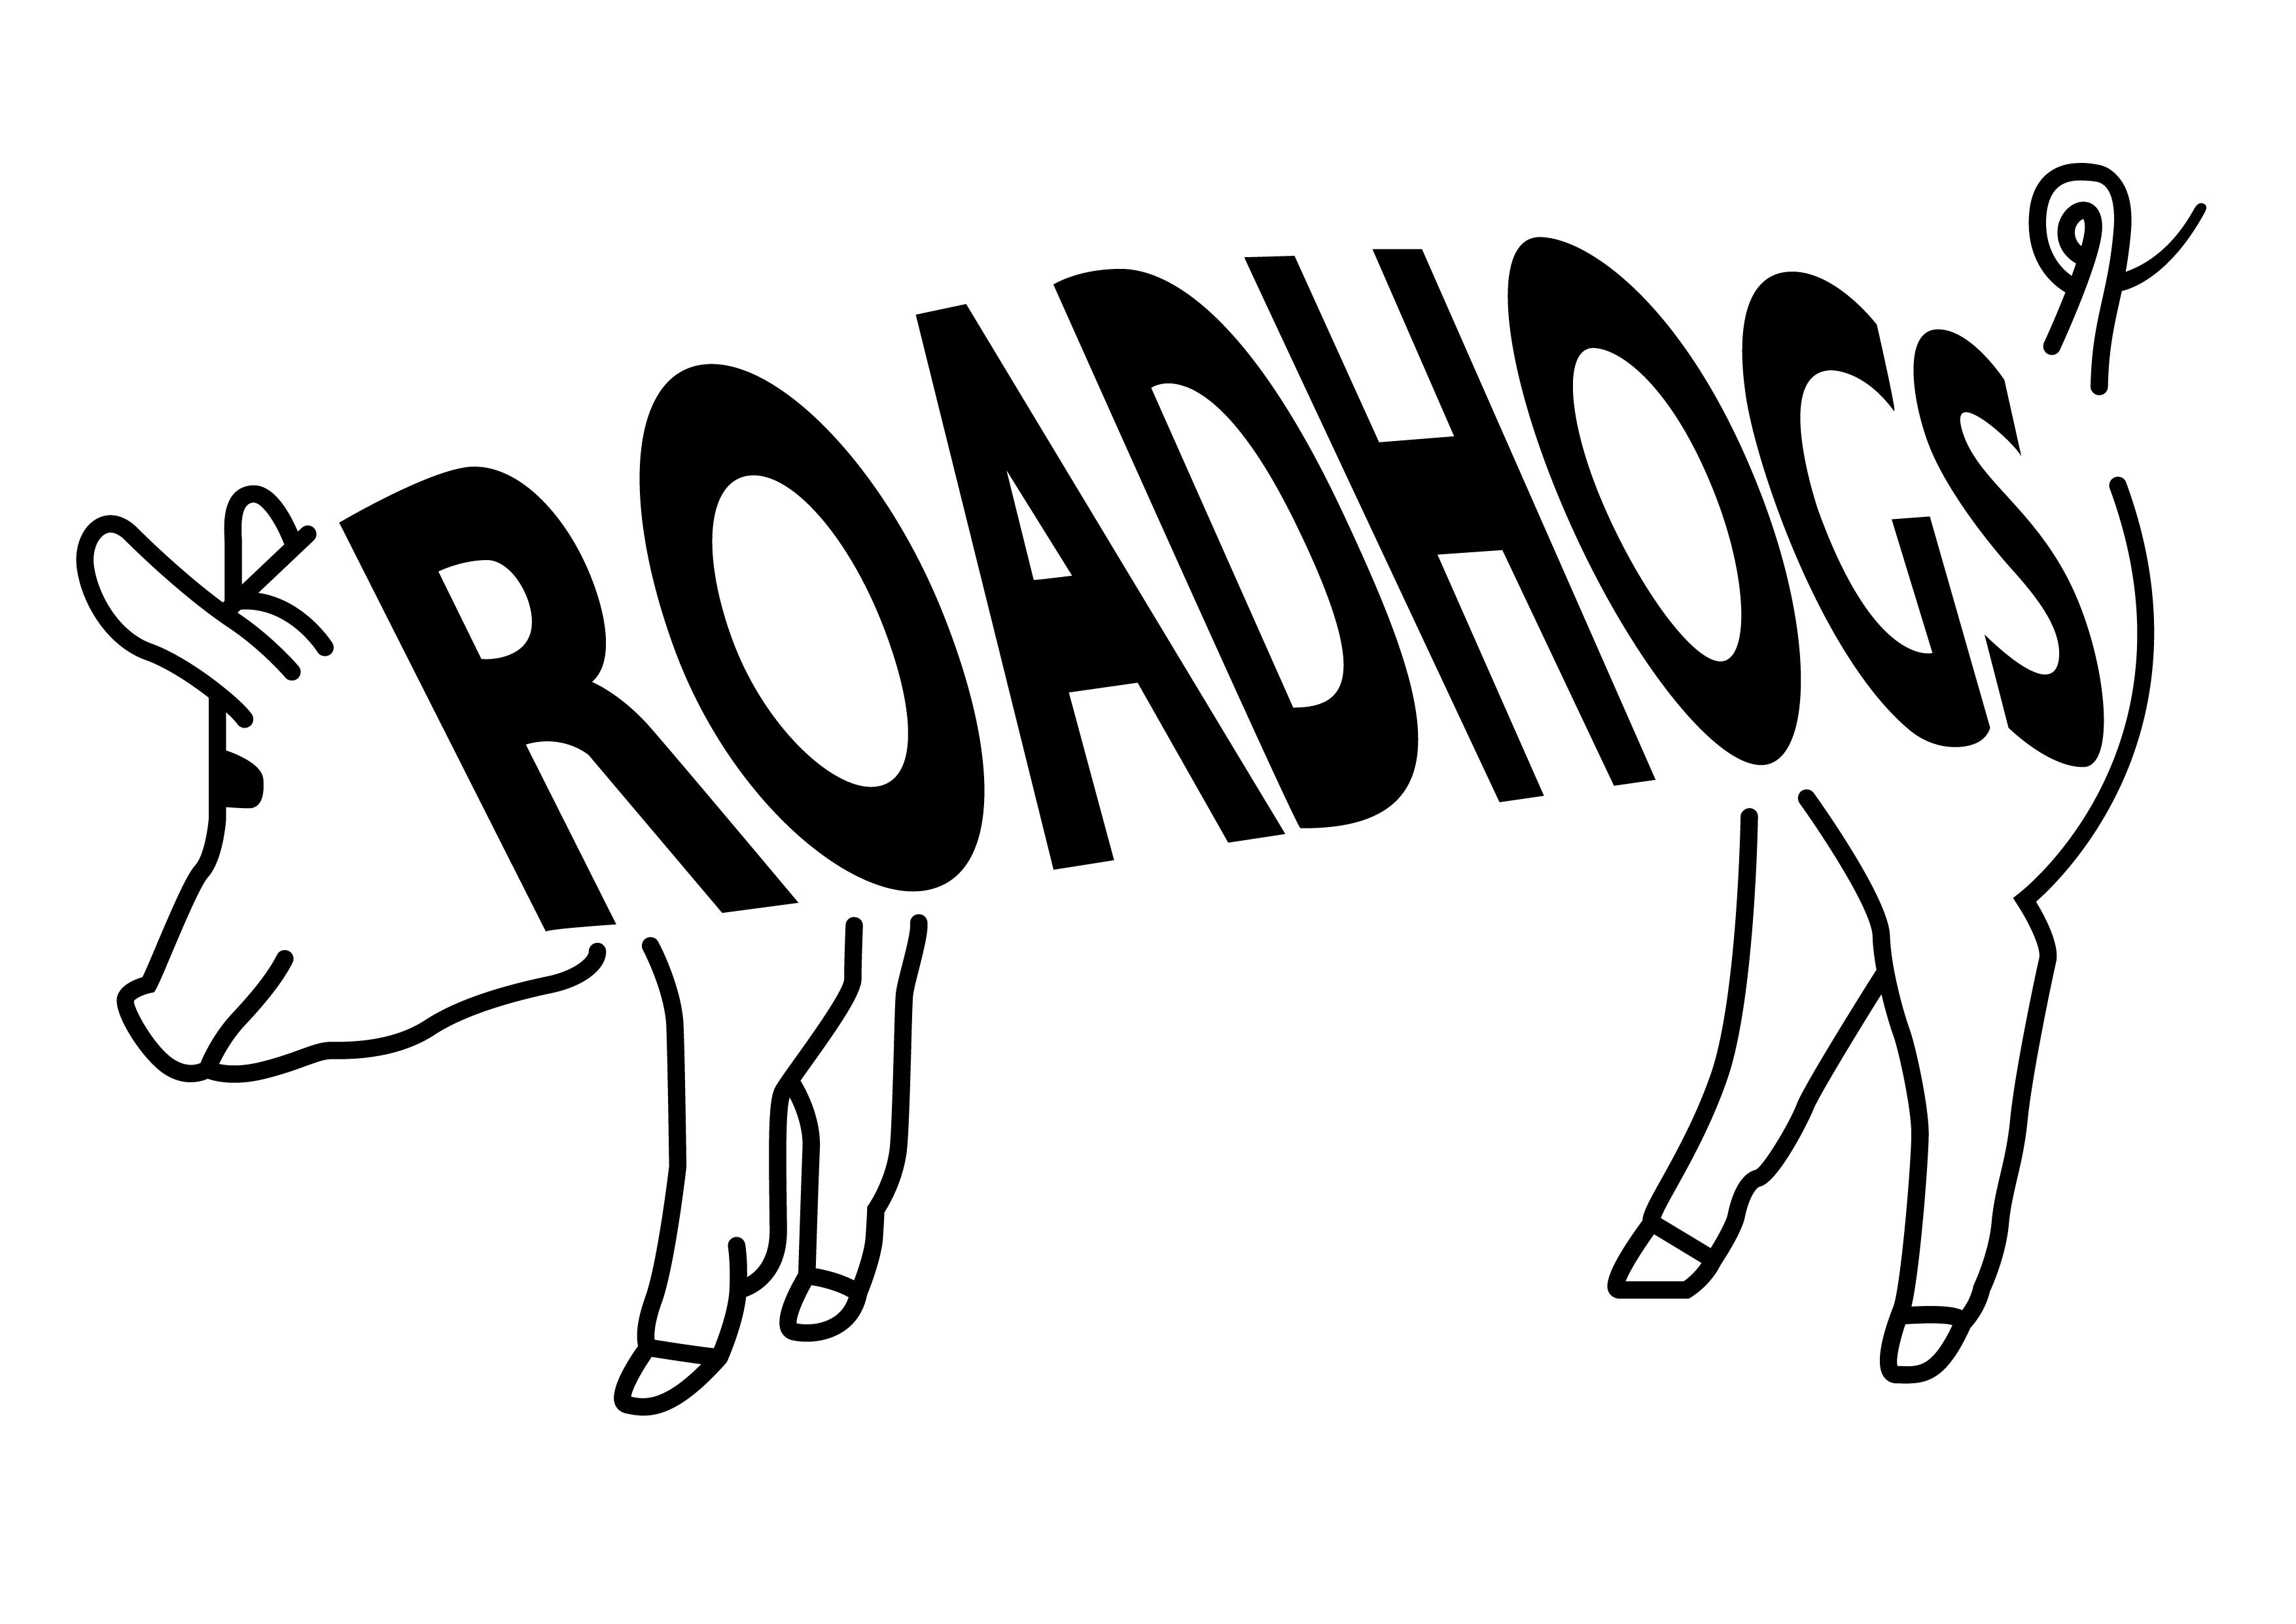 Roadhogs Recruitment Ltd